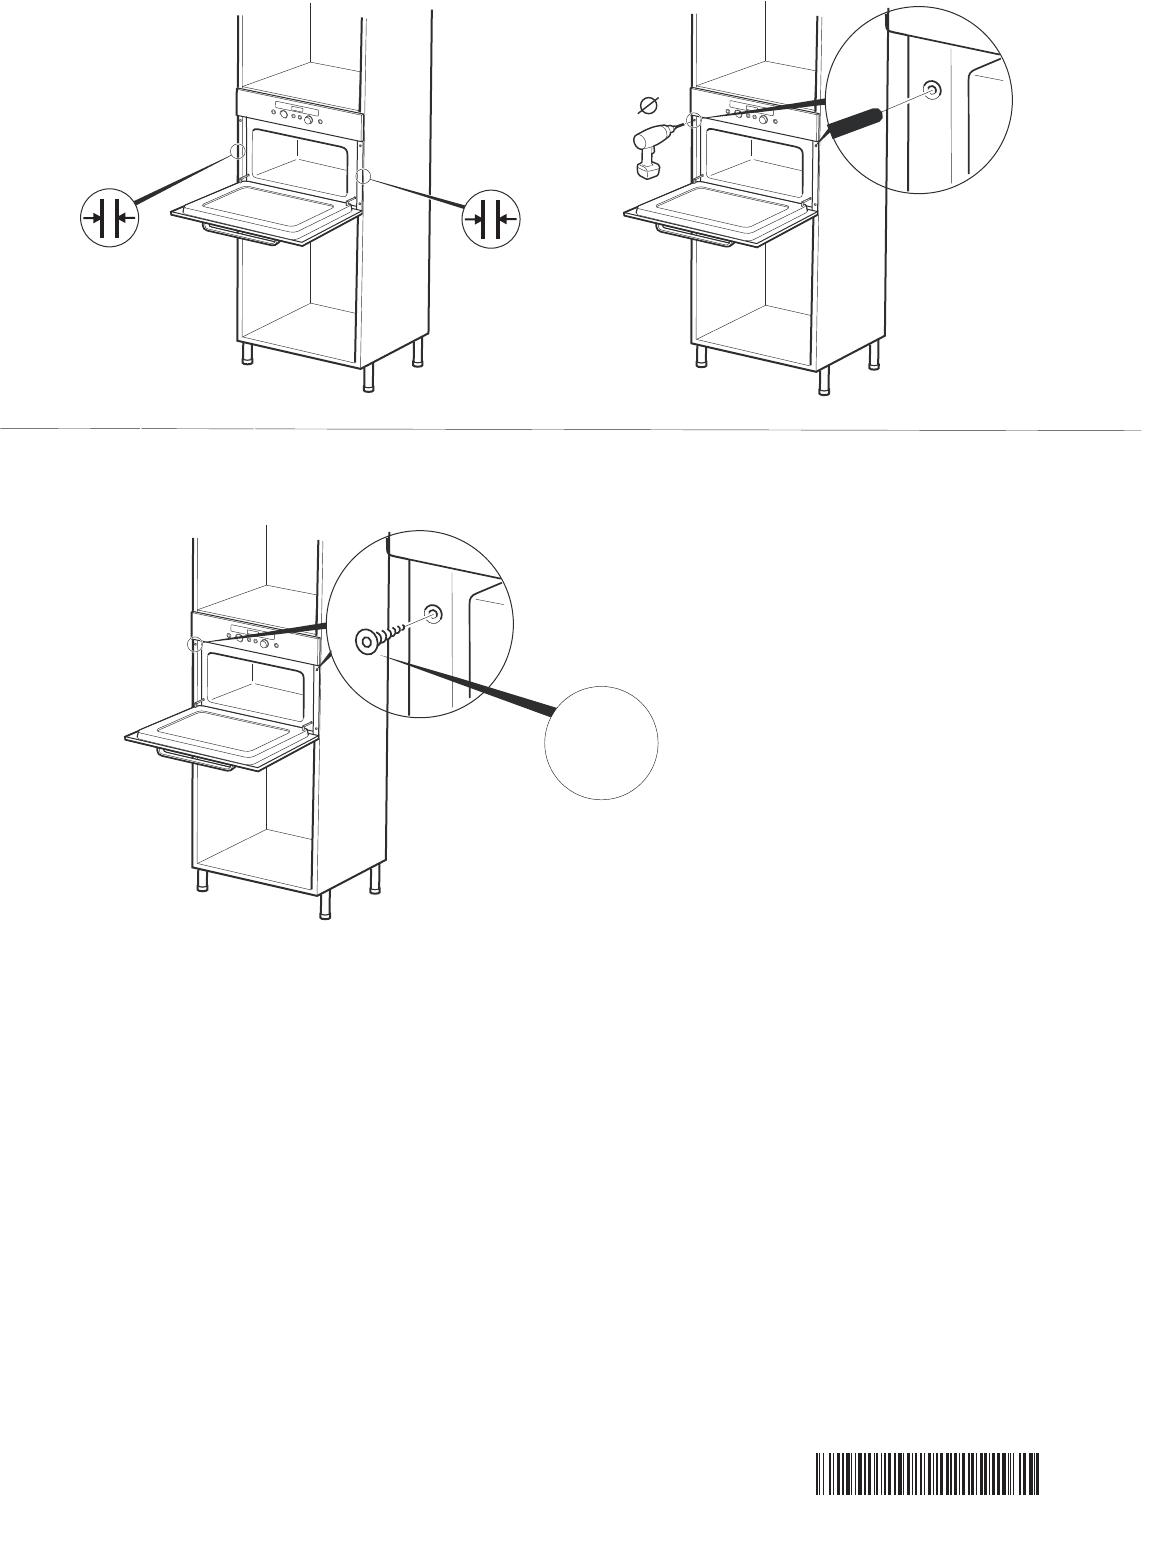 Whirlpool amw 840 ix handleiding